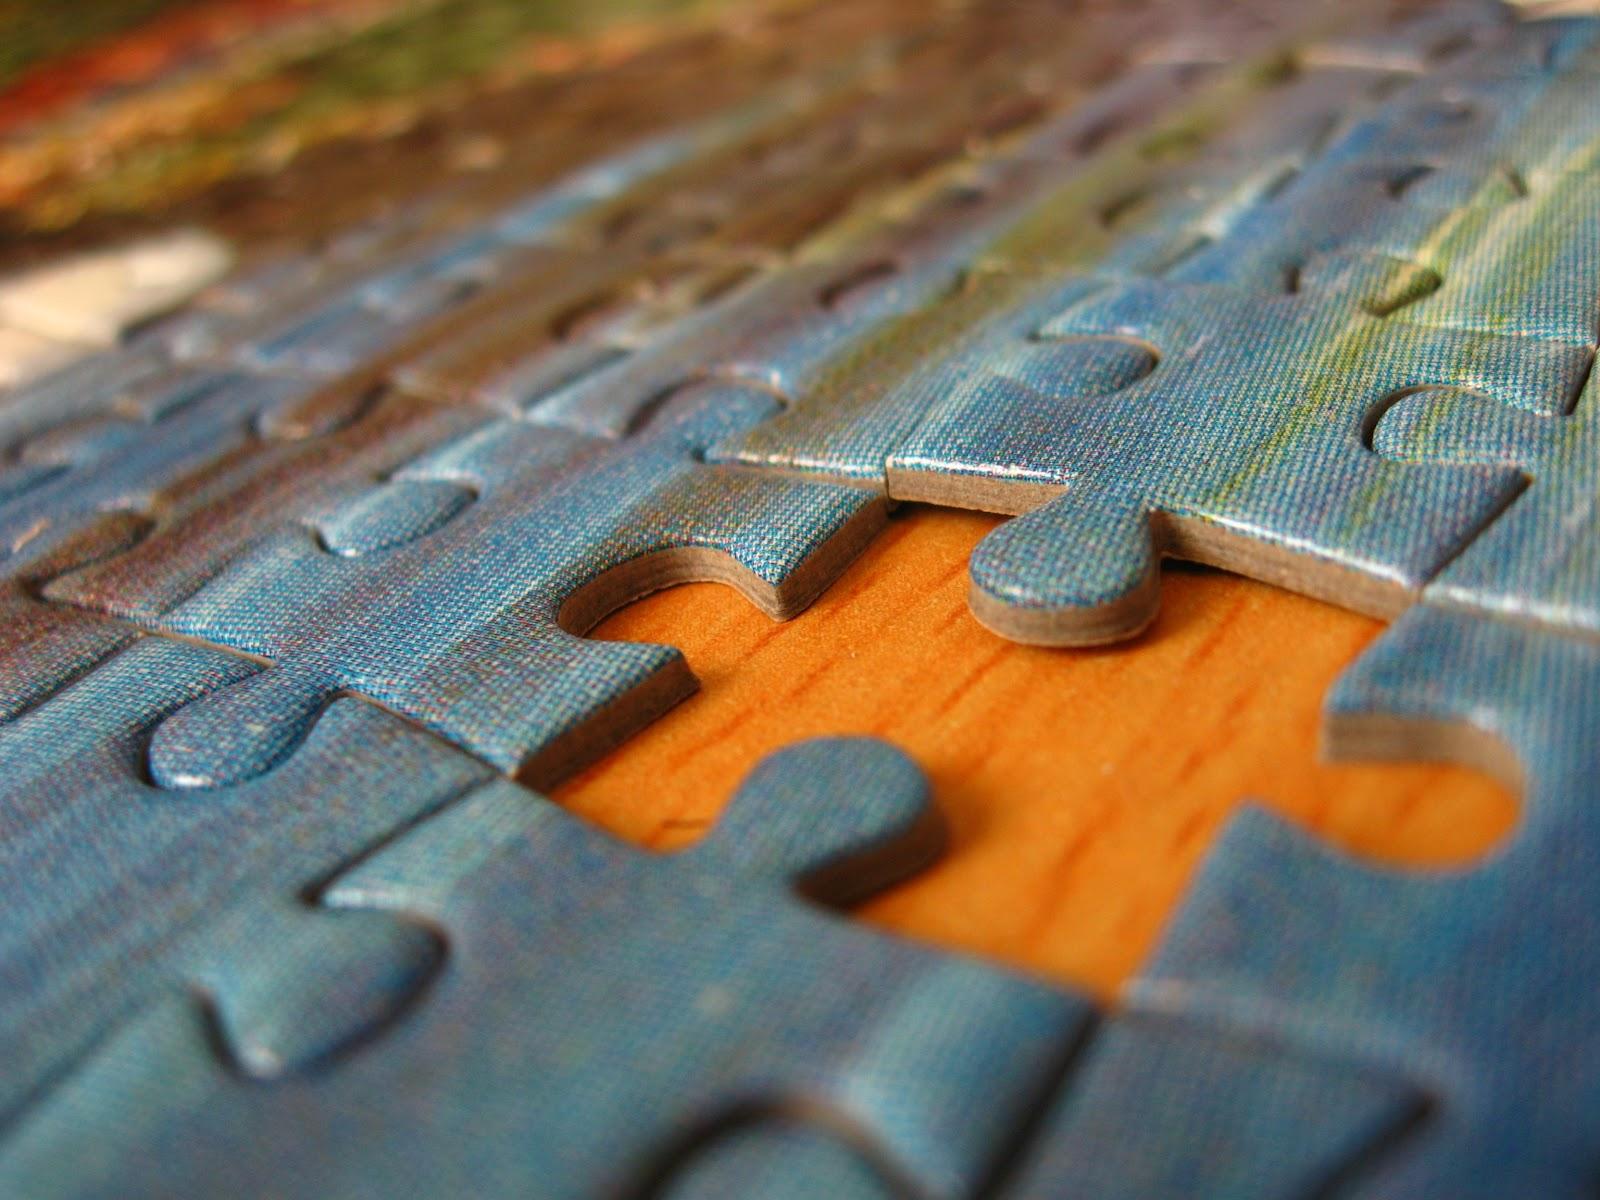 Missing-puzzle-piece1.jpeg